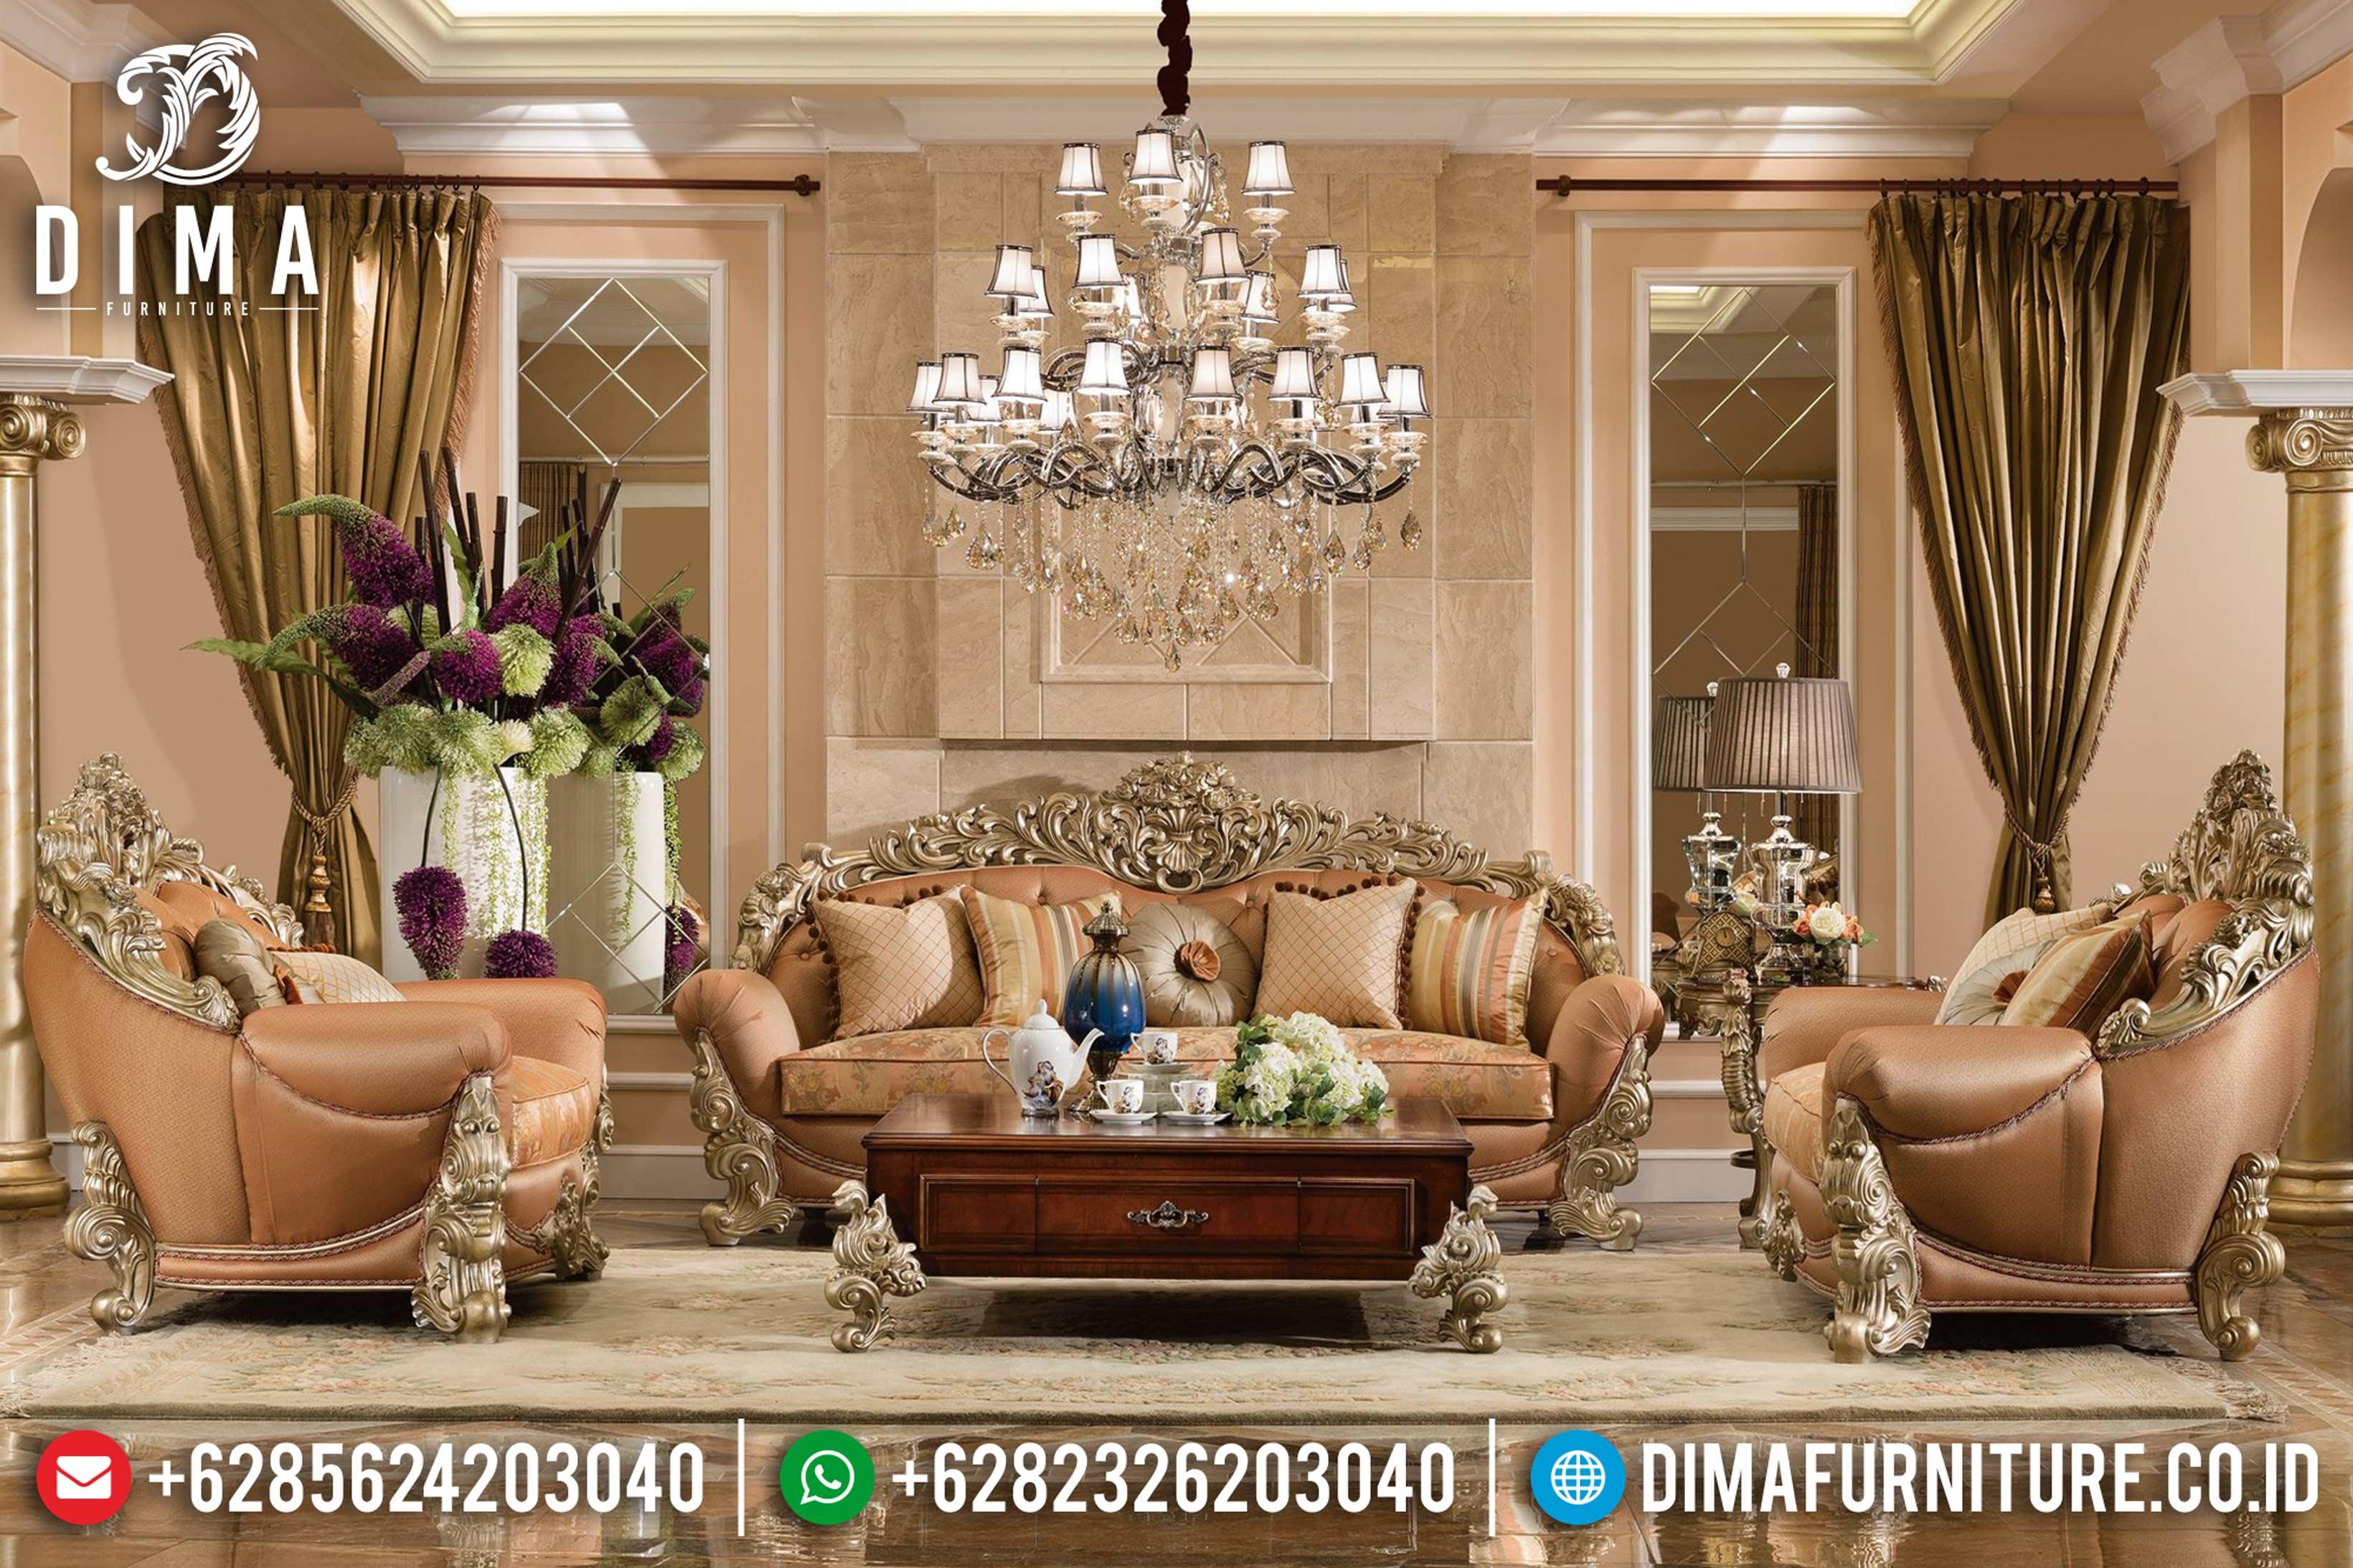 Sofa Tamu Jepara Mewah Terbaru Super Luxury Waldrof Brunello DF-0633